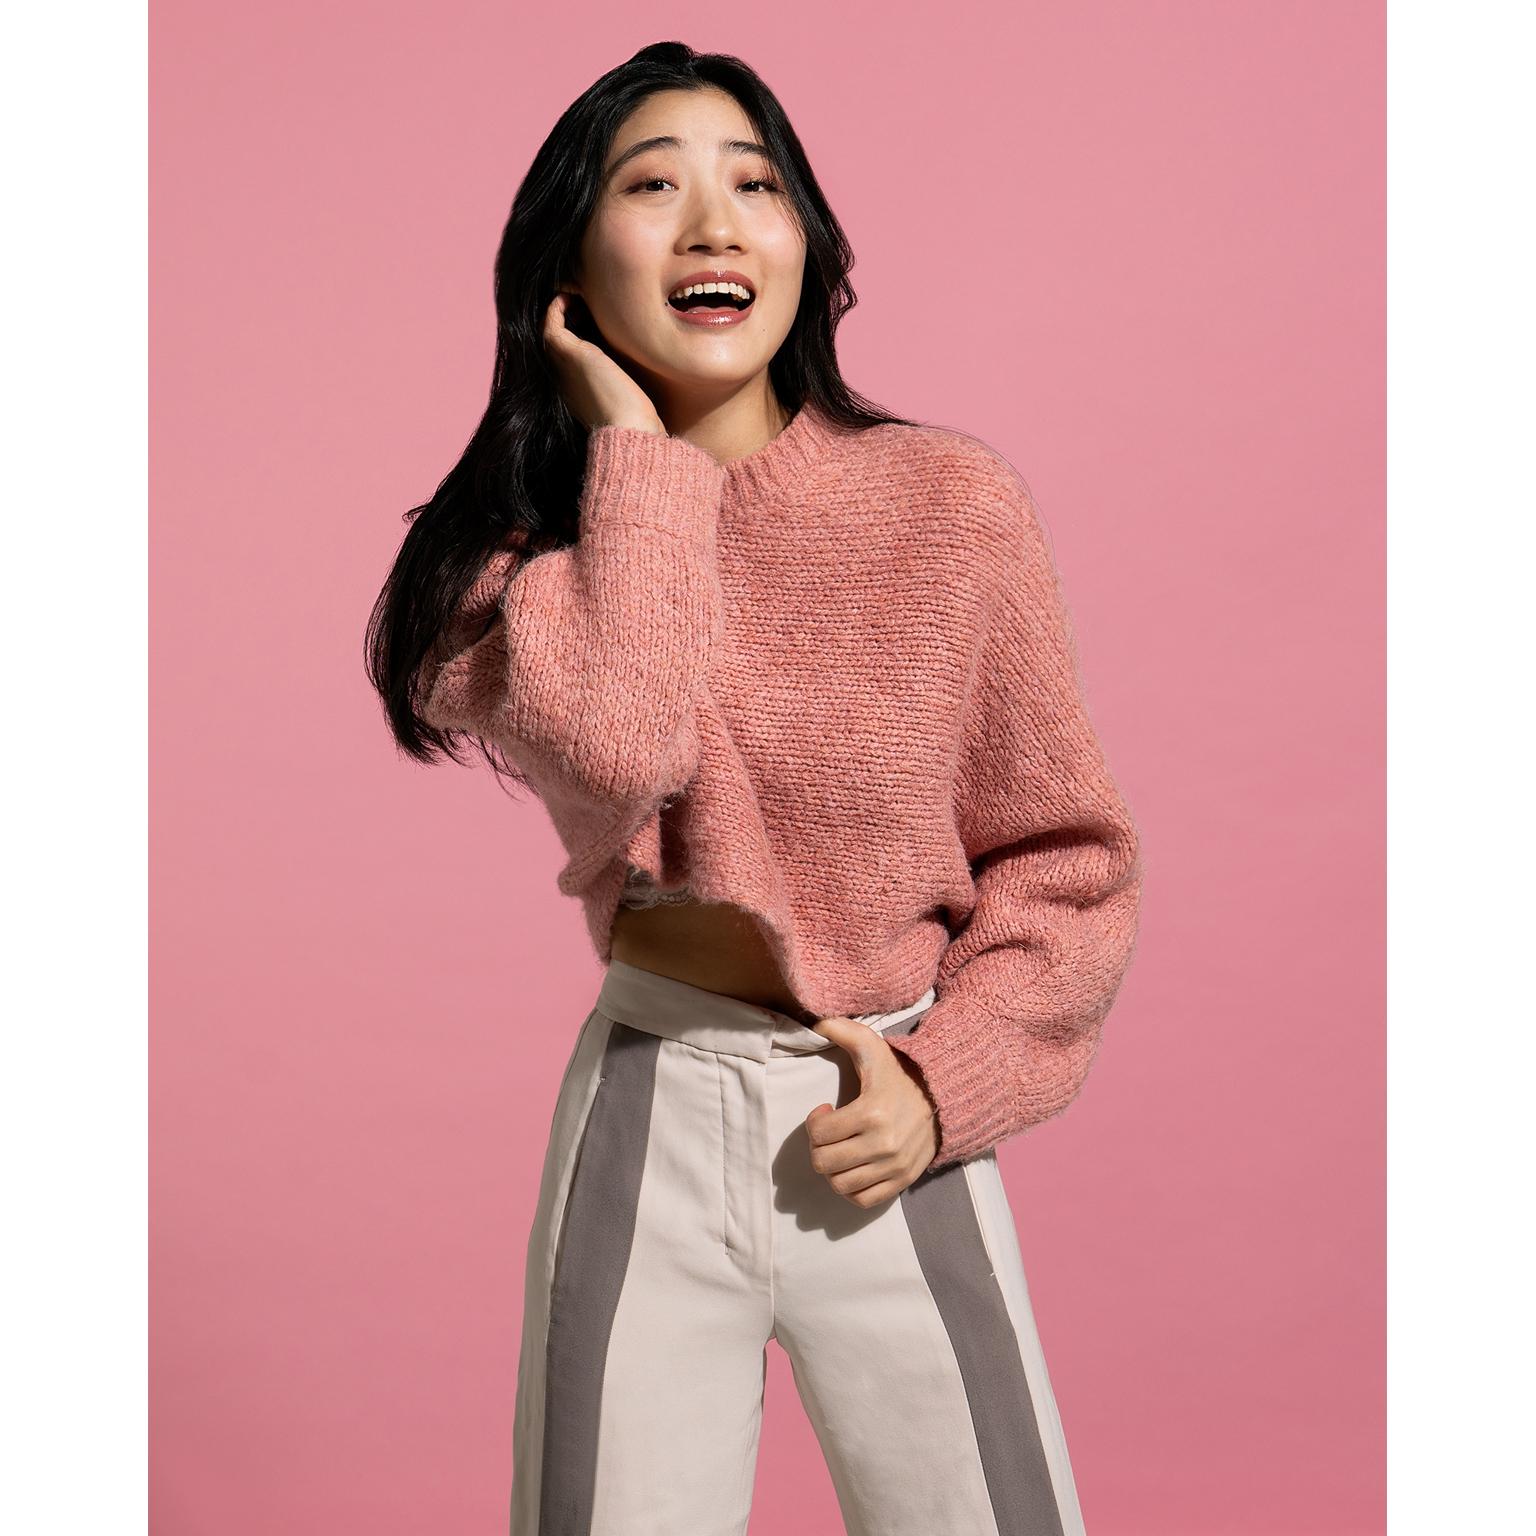 Toronto-Fitness-Model-Agency-Lifestyle-Casual-Helen-Wang